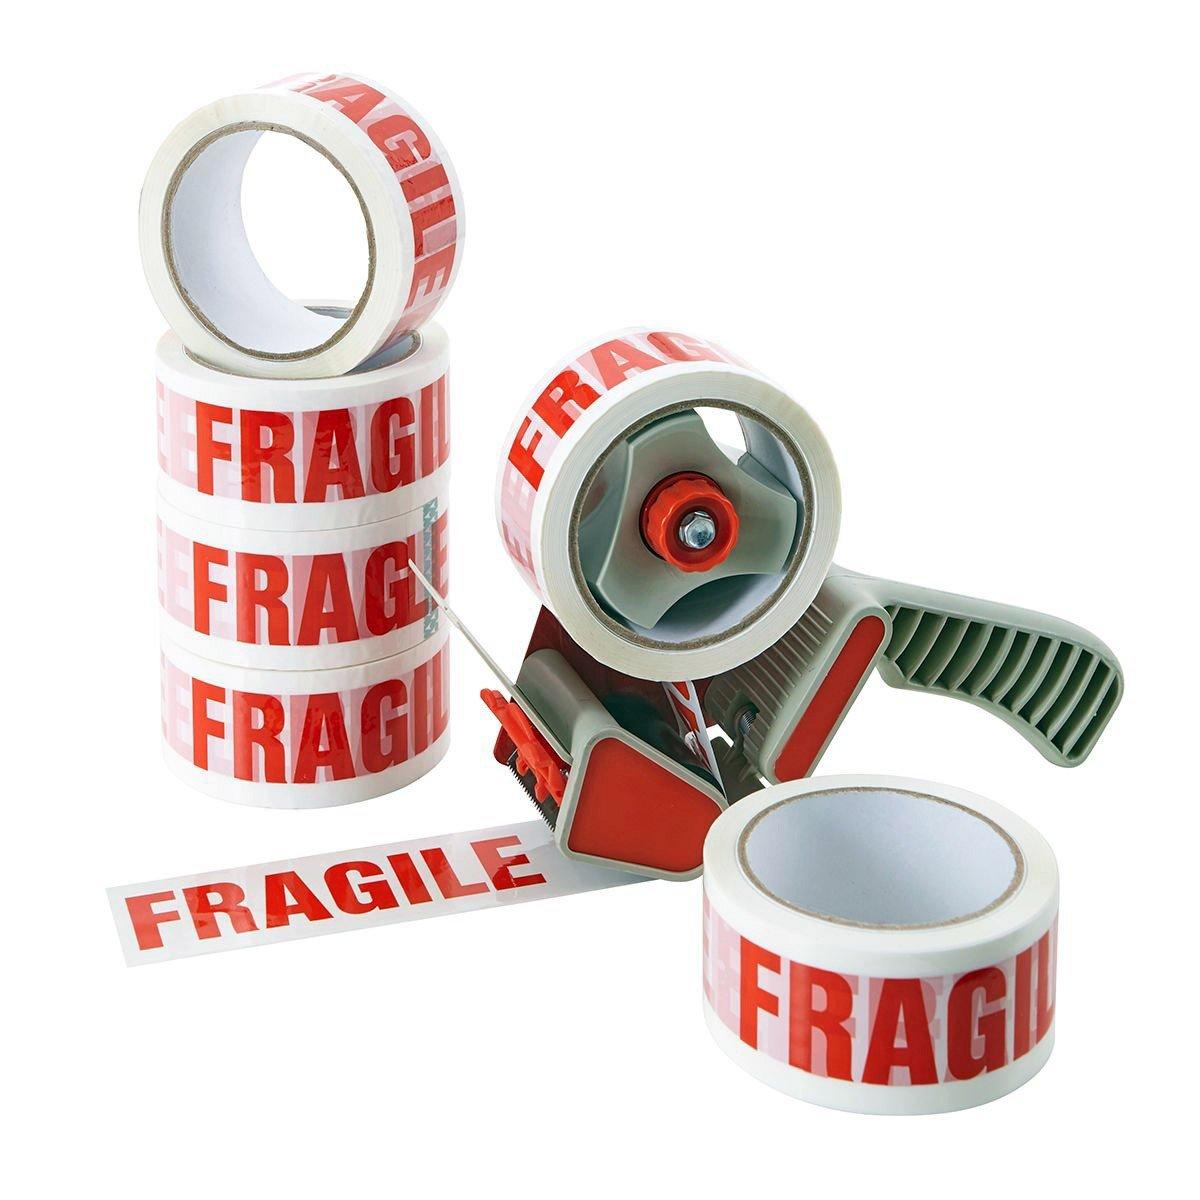 ACIT FRAGILE Nastro Adesivo con Scritta Fragile